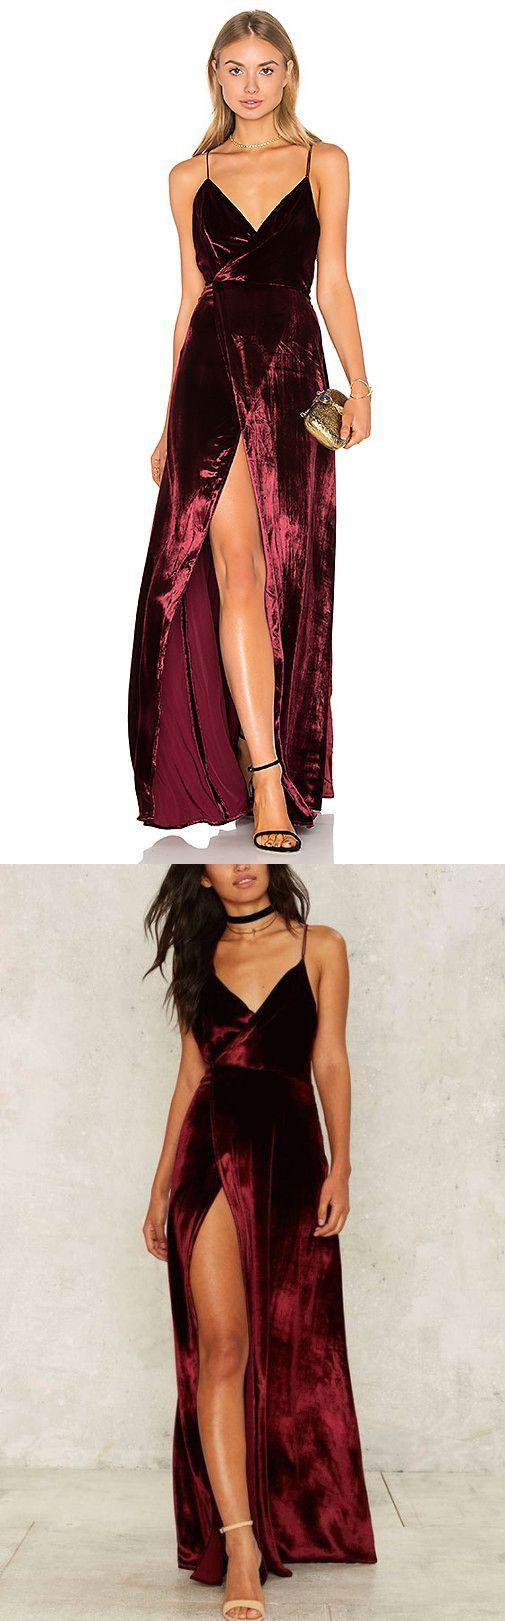 Long prom gowns evening dress burgundy slit prom dressprom dresses